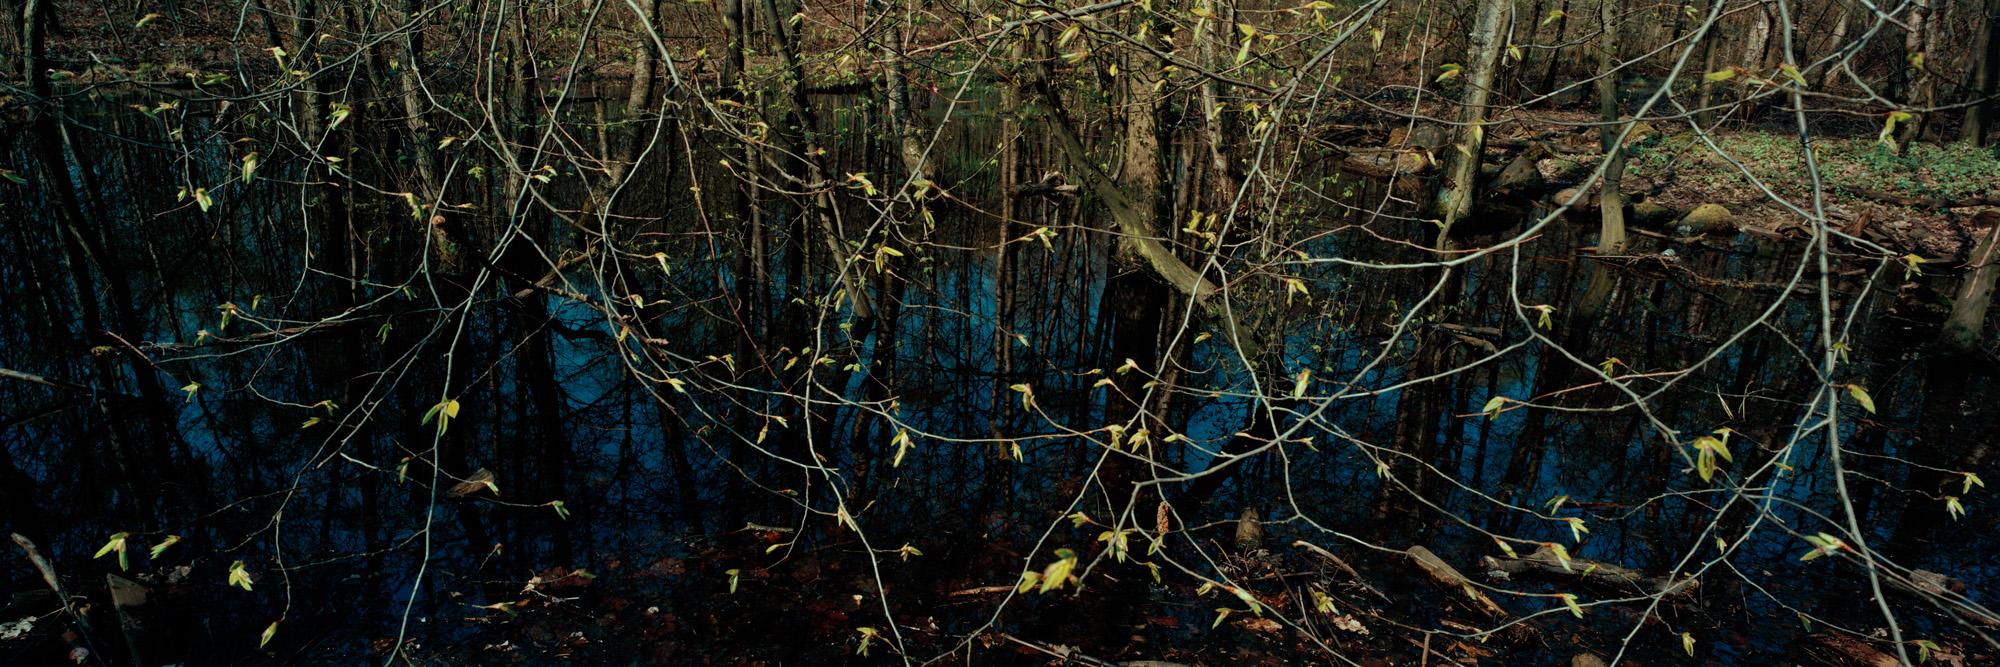 Wasser, water, Eis, ice, Landschaft, landscape, Weitblick, view, large format photography, Grossformatfotografie, Grossformatphotographie, Fotografie, Photographie, photography, white, weiss, blue, blau, green, grün, 6x17